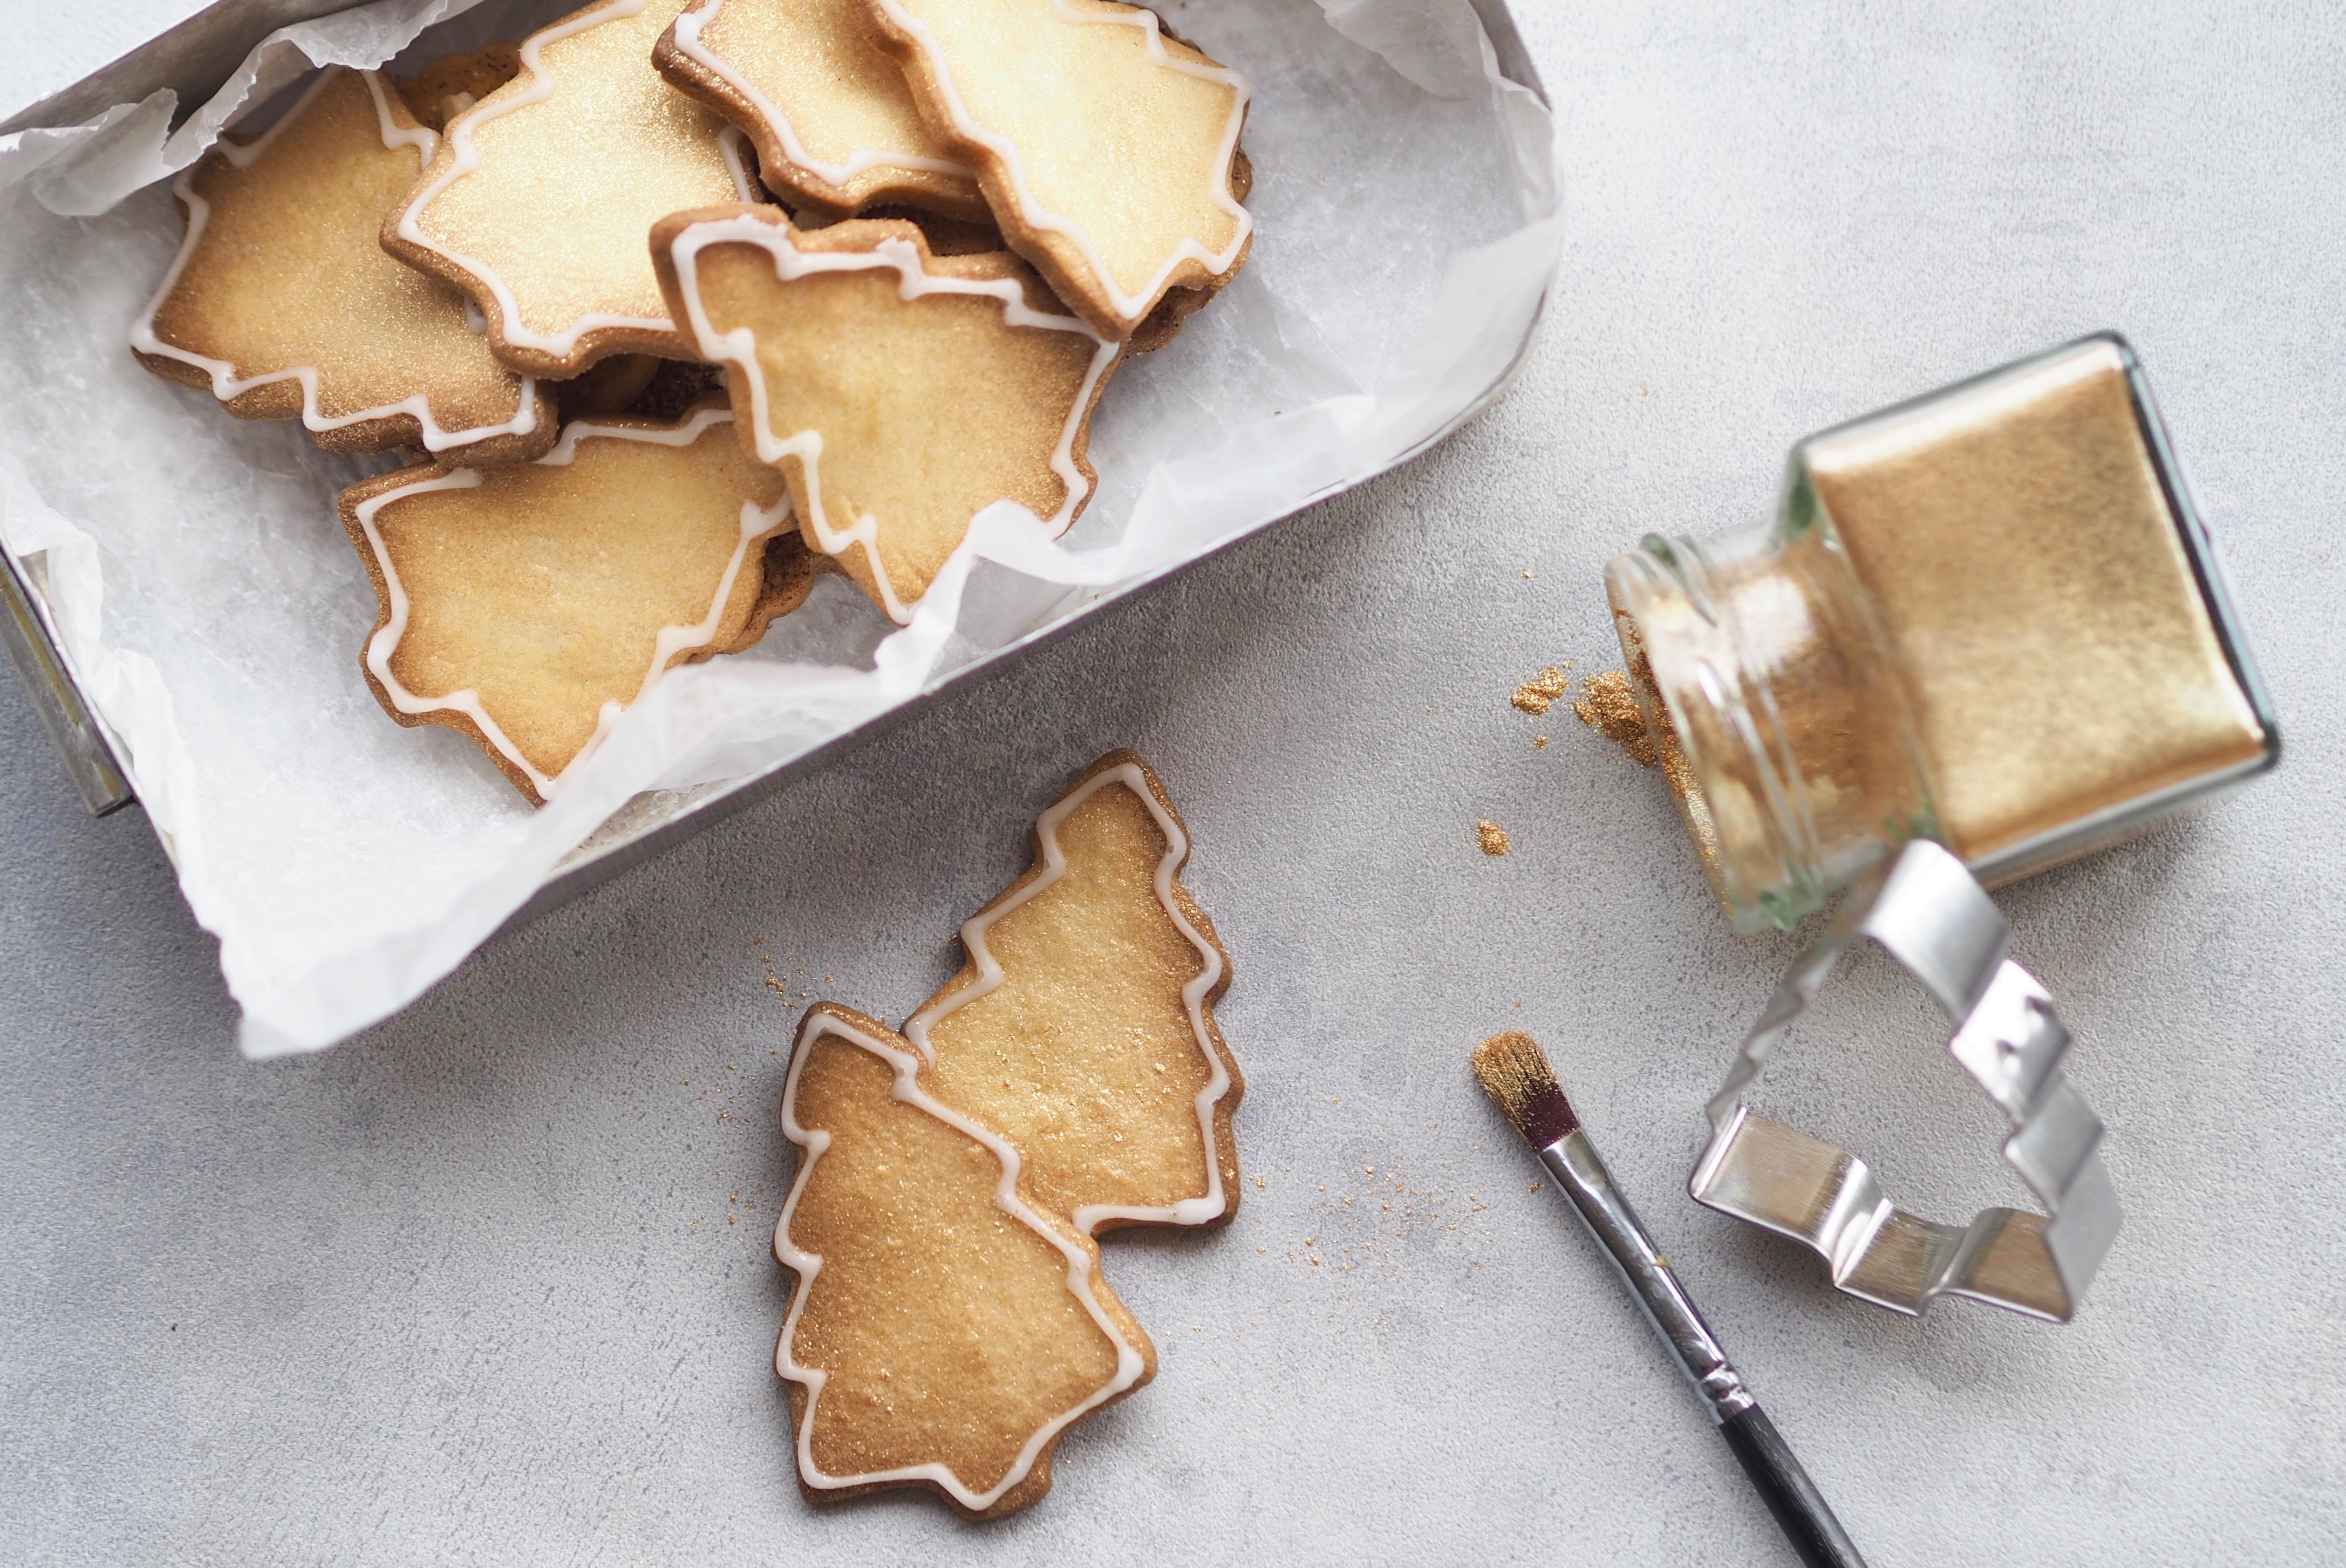 Julesmåkager guld småkager juletræ